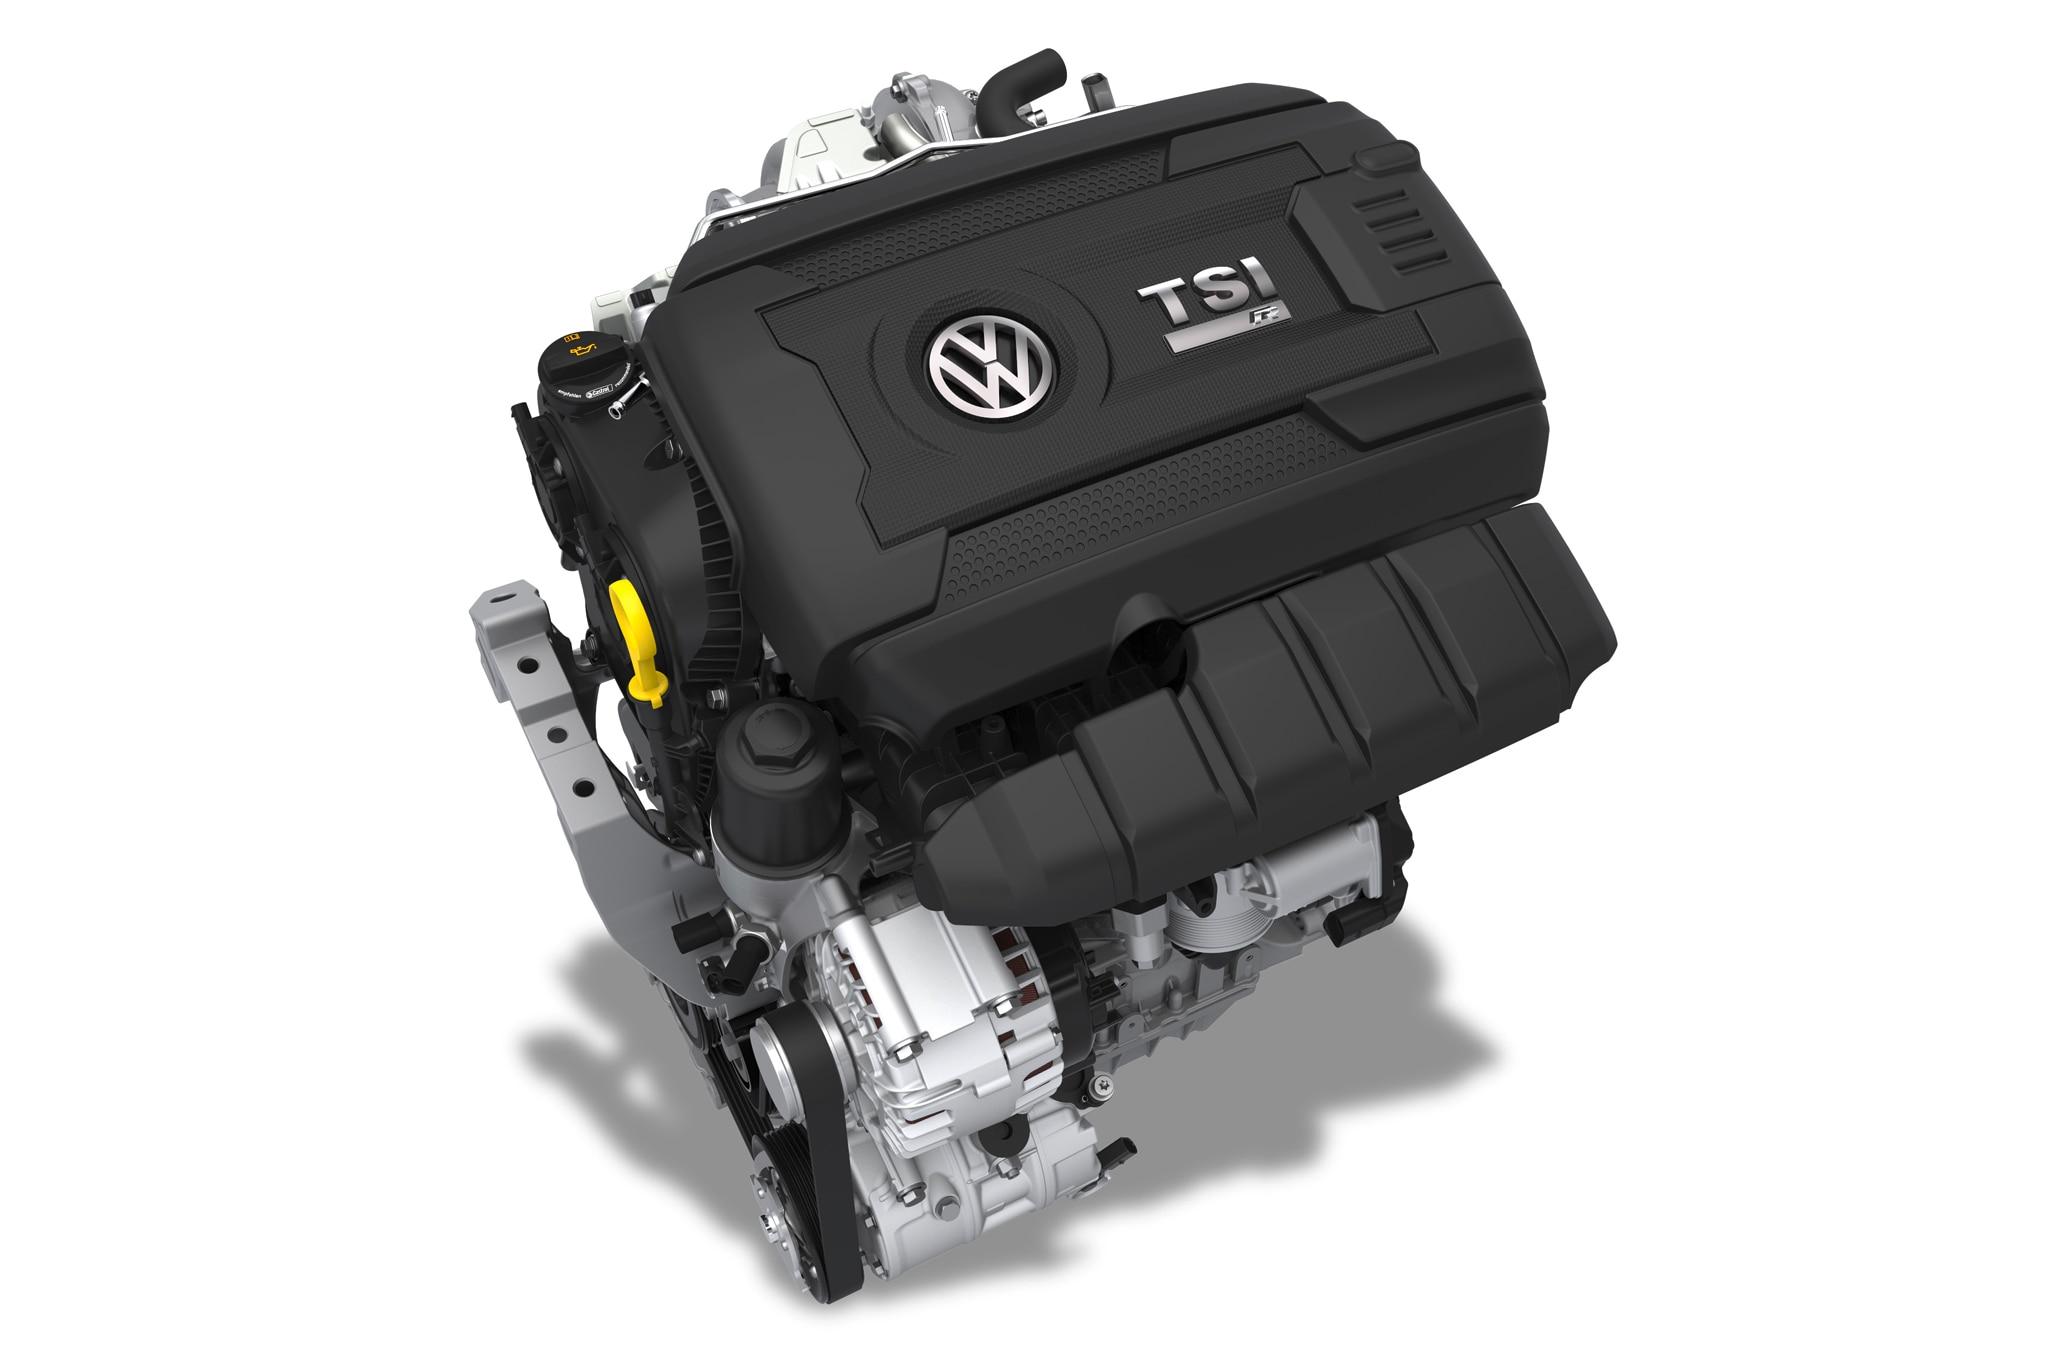 Golf r 2014 engine